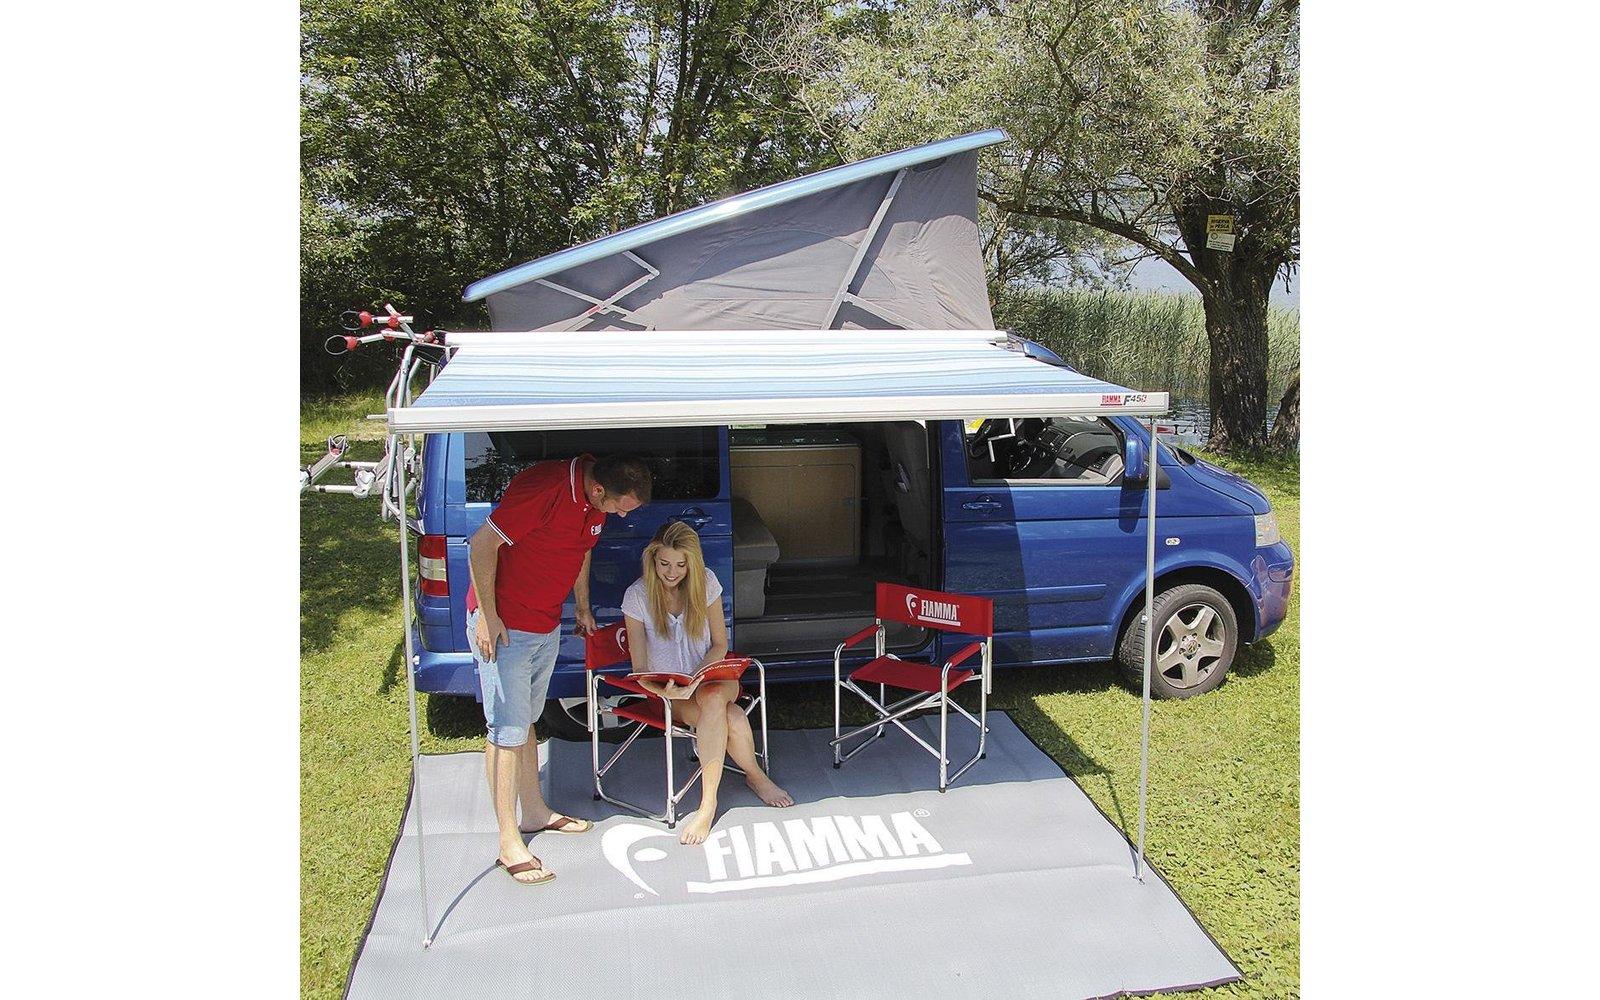 fiamma markise f45 s vw t5 fritz berger campingbedarf. Black Bedroom Furniture Sets. Home Design Ideas